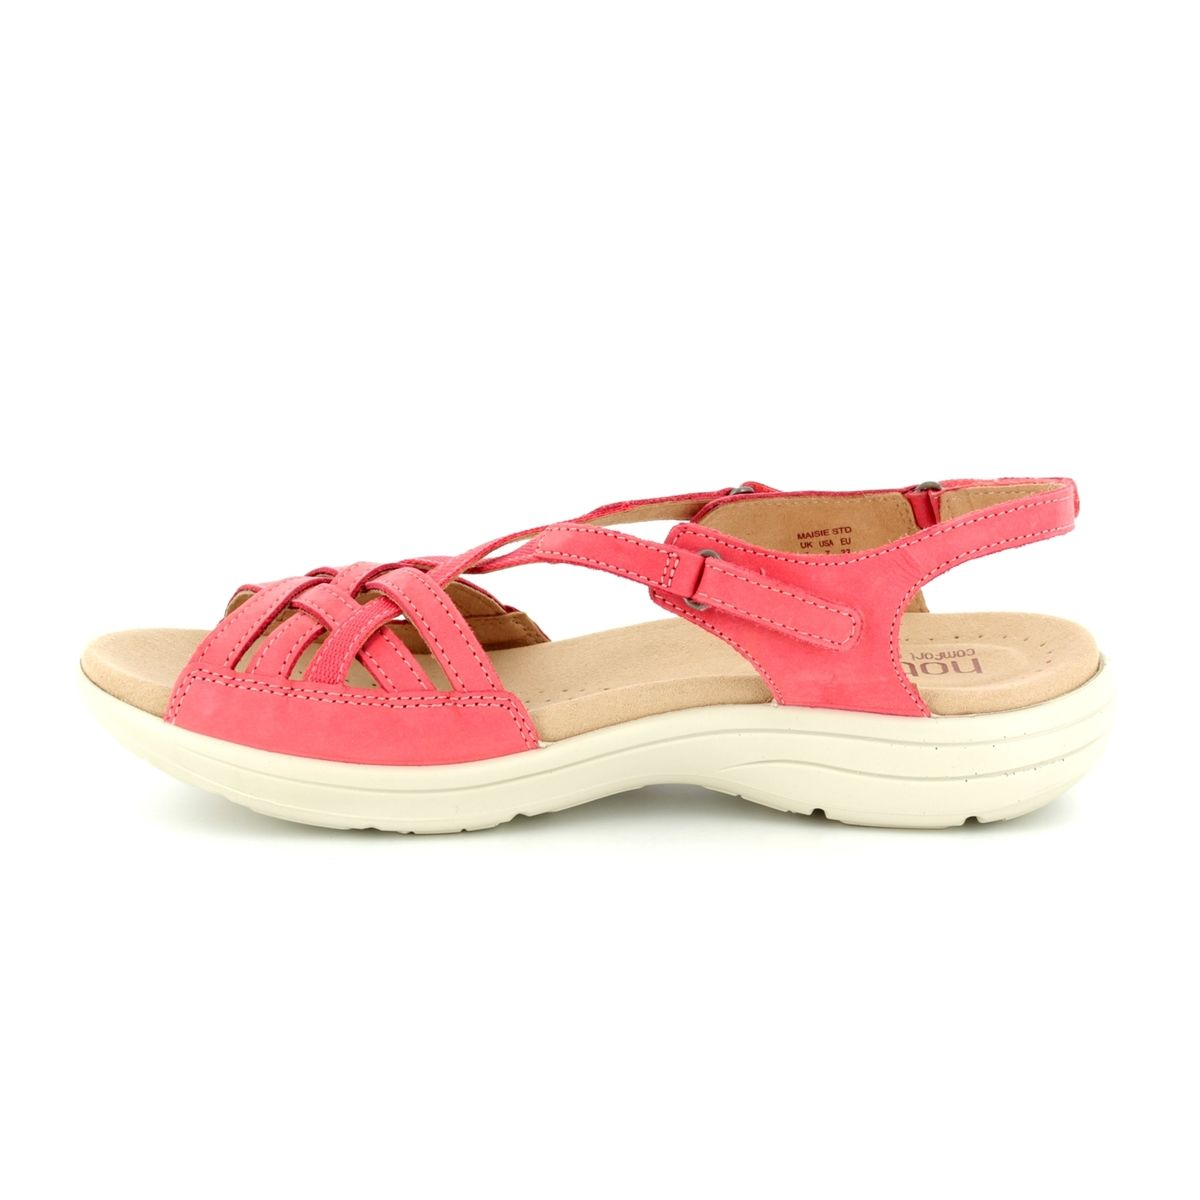 Hotter Sandals C Pink 8109 80 Maisie E Fit